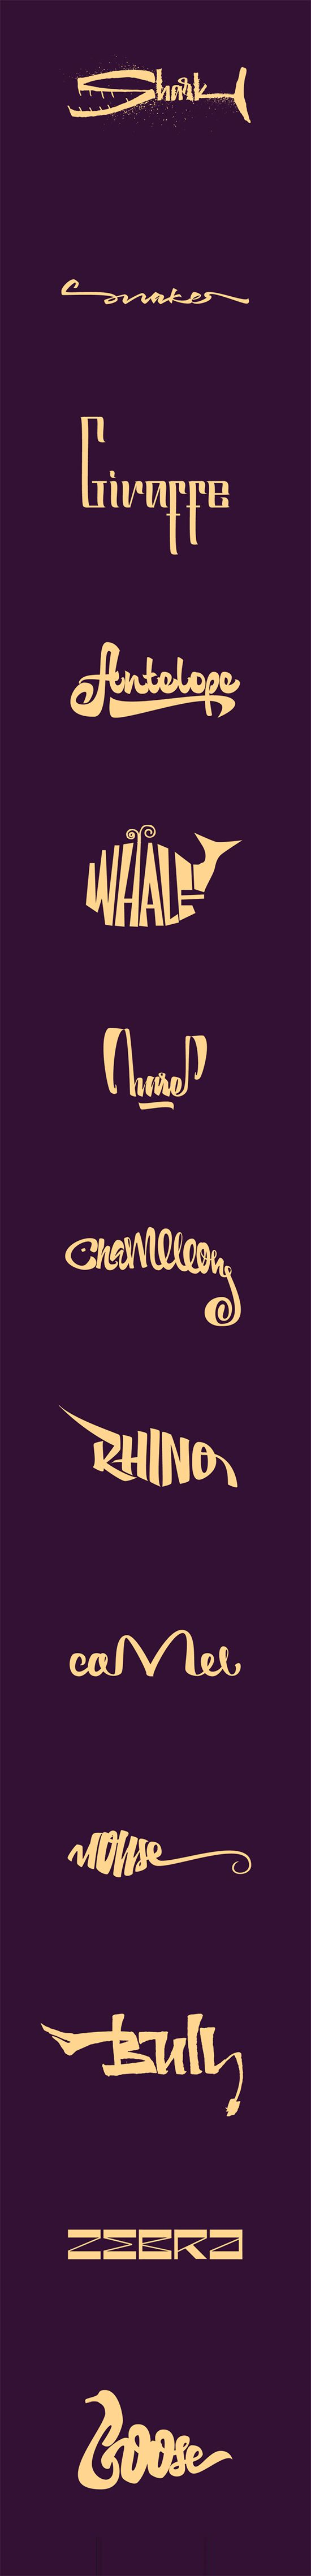 Cassandra cappello graphic design toronto - Find This Pin And More On Logo Design